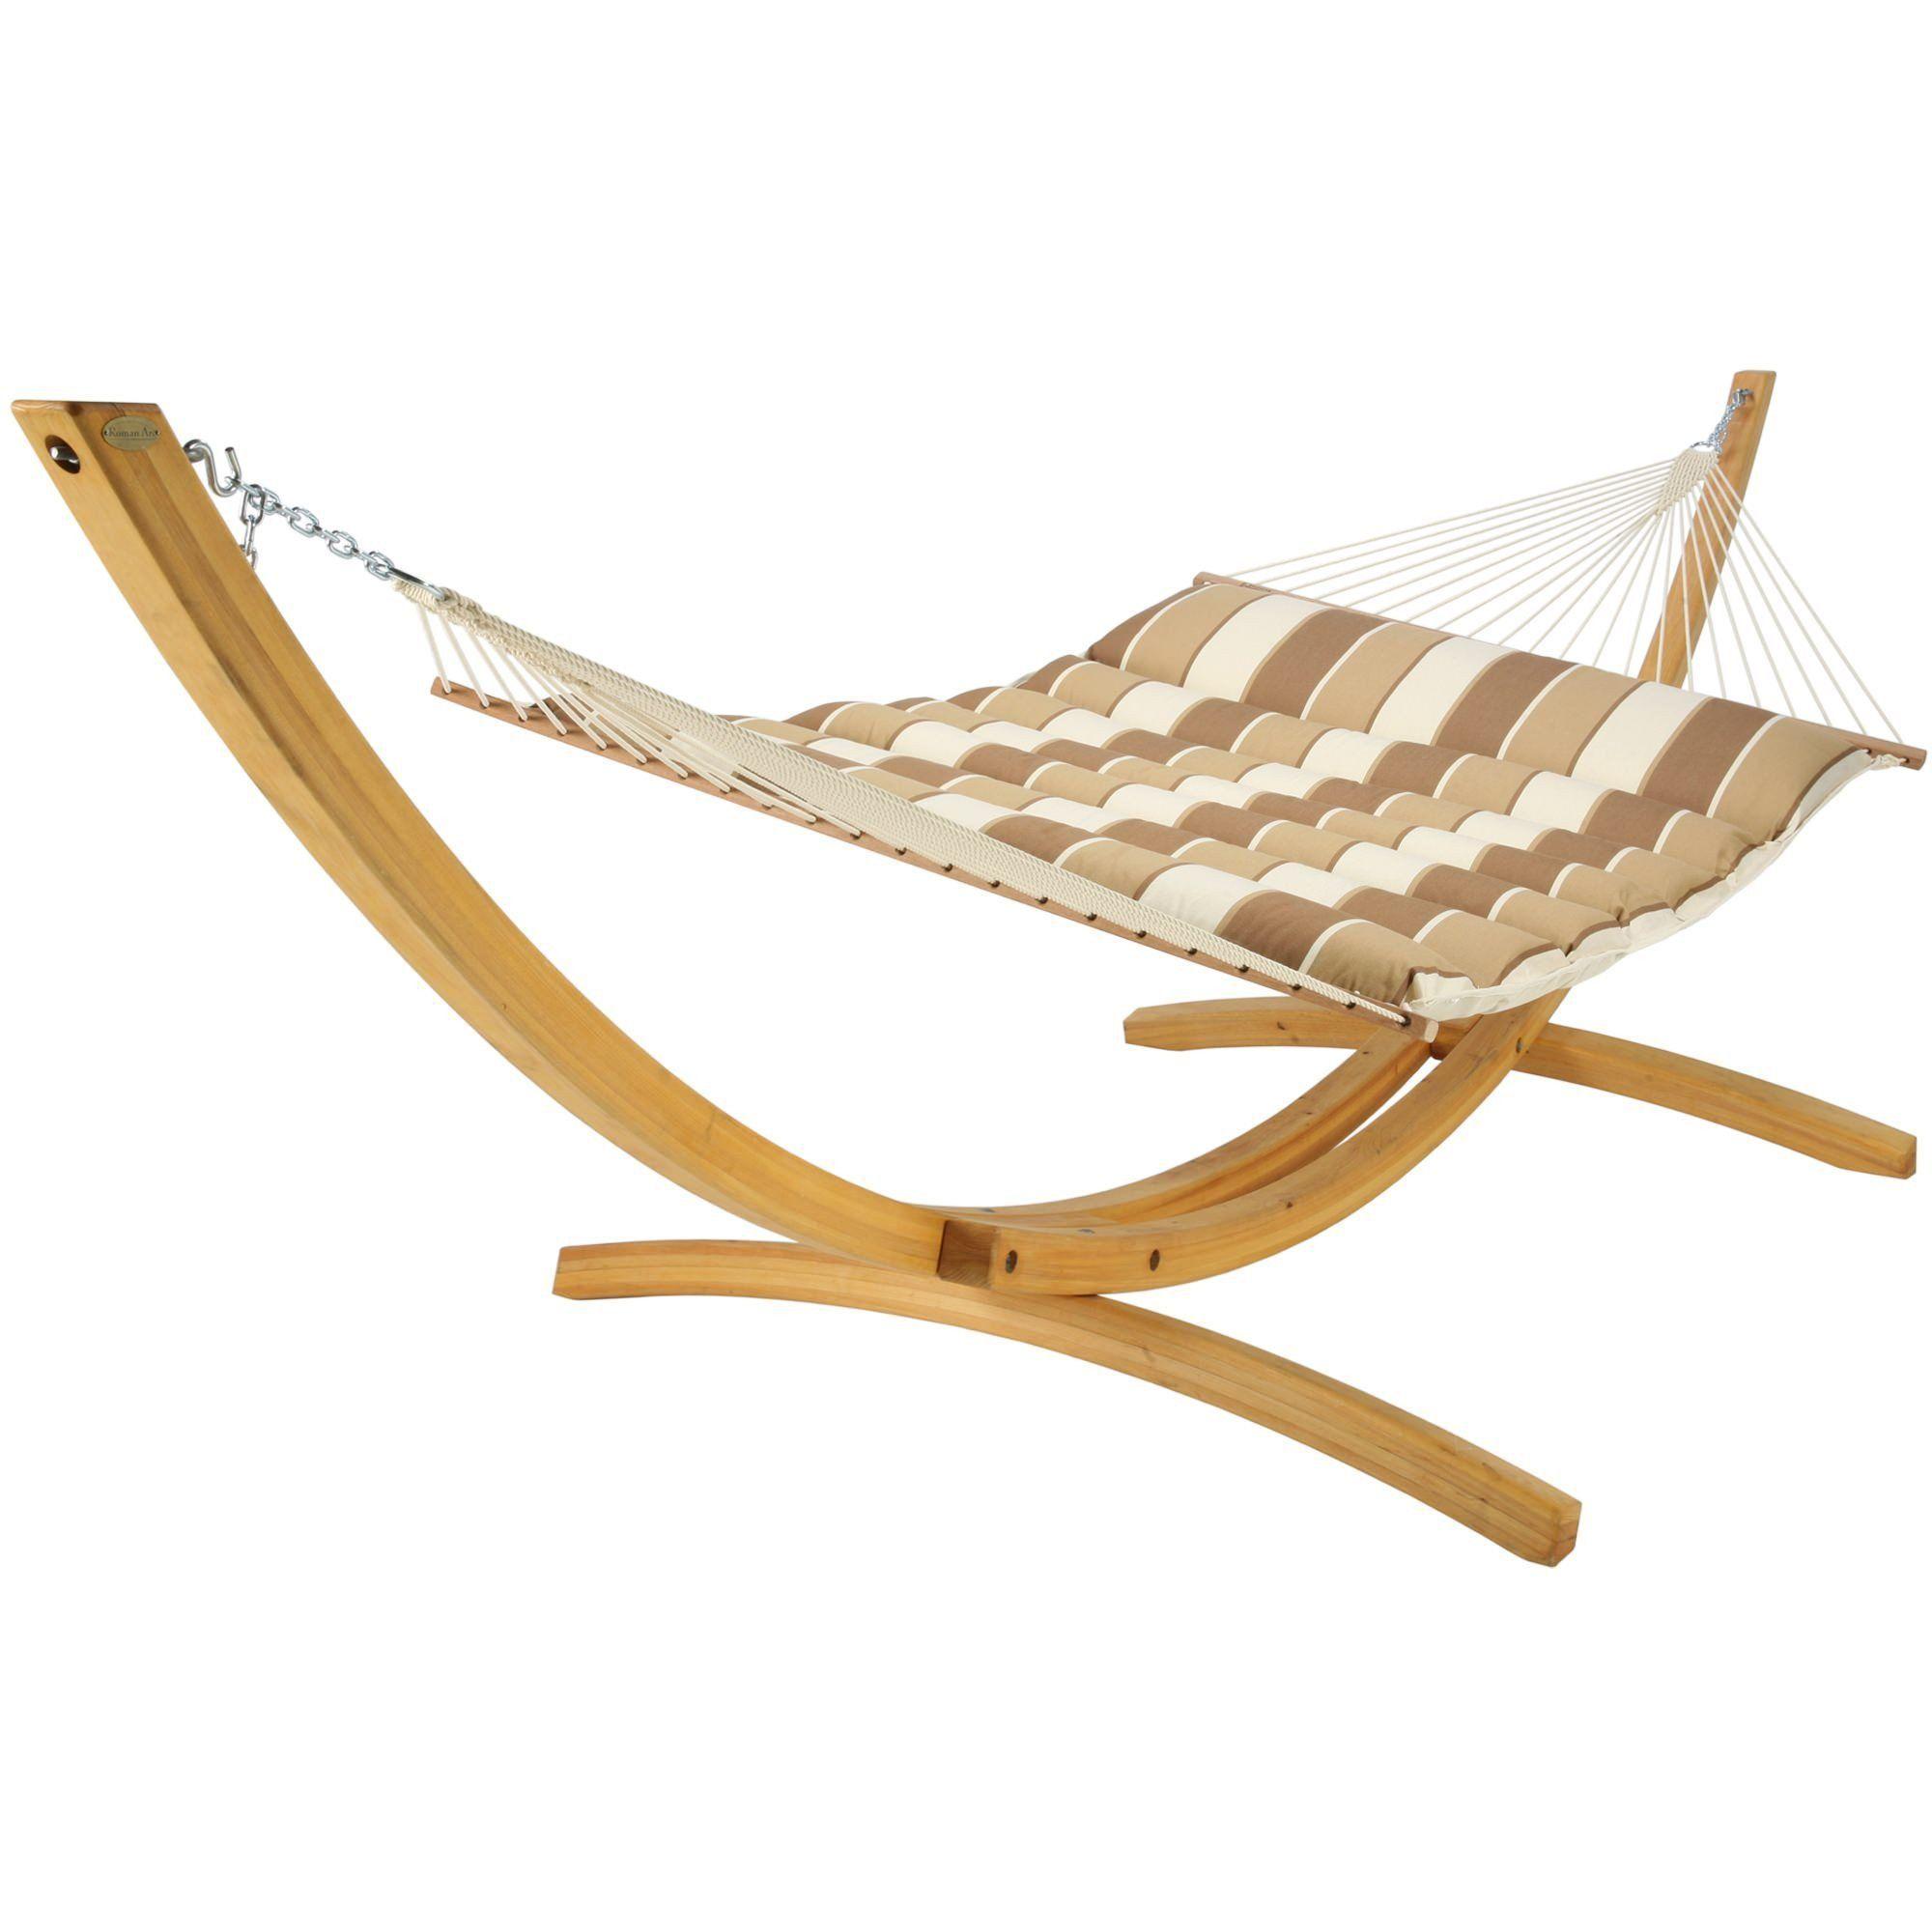 hatteras hammocks pillowtop hammock   rio birch stripe hatteras hammocks pillowtop hammock   rio birch stripe   hammock      rh   pinterest